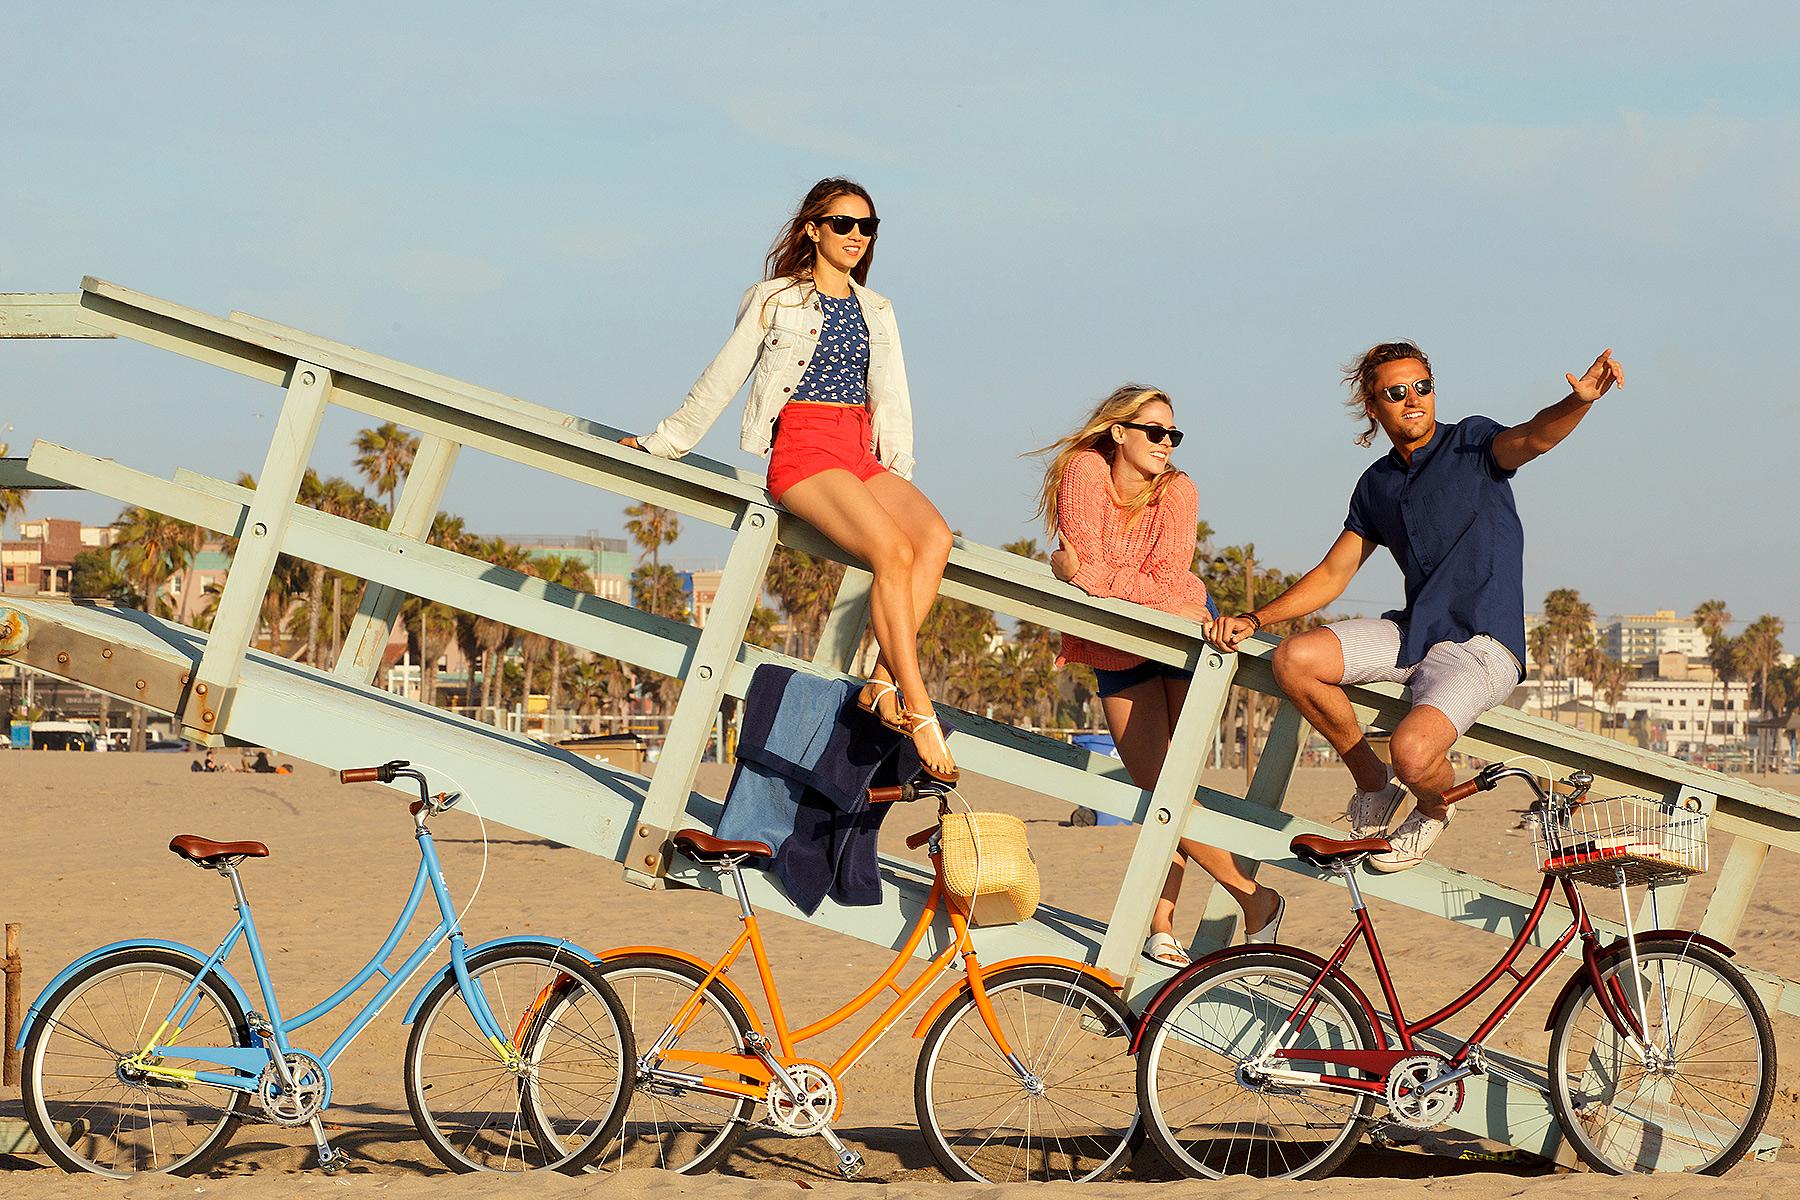 Brilliant-bicycle-538.jpg